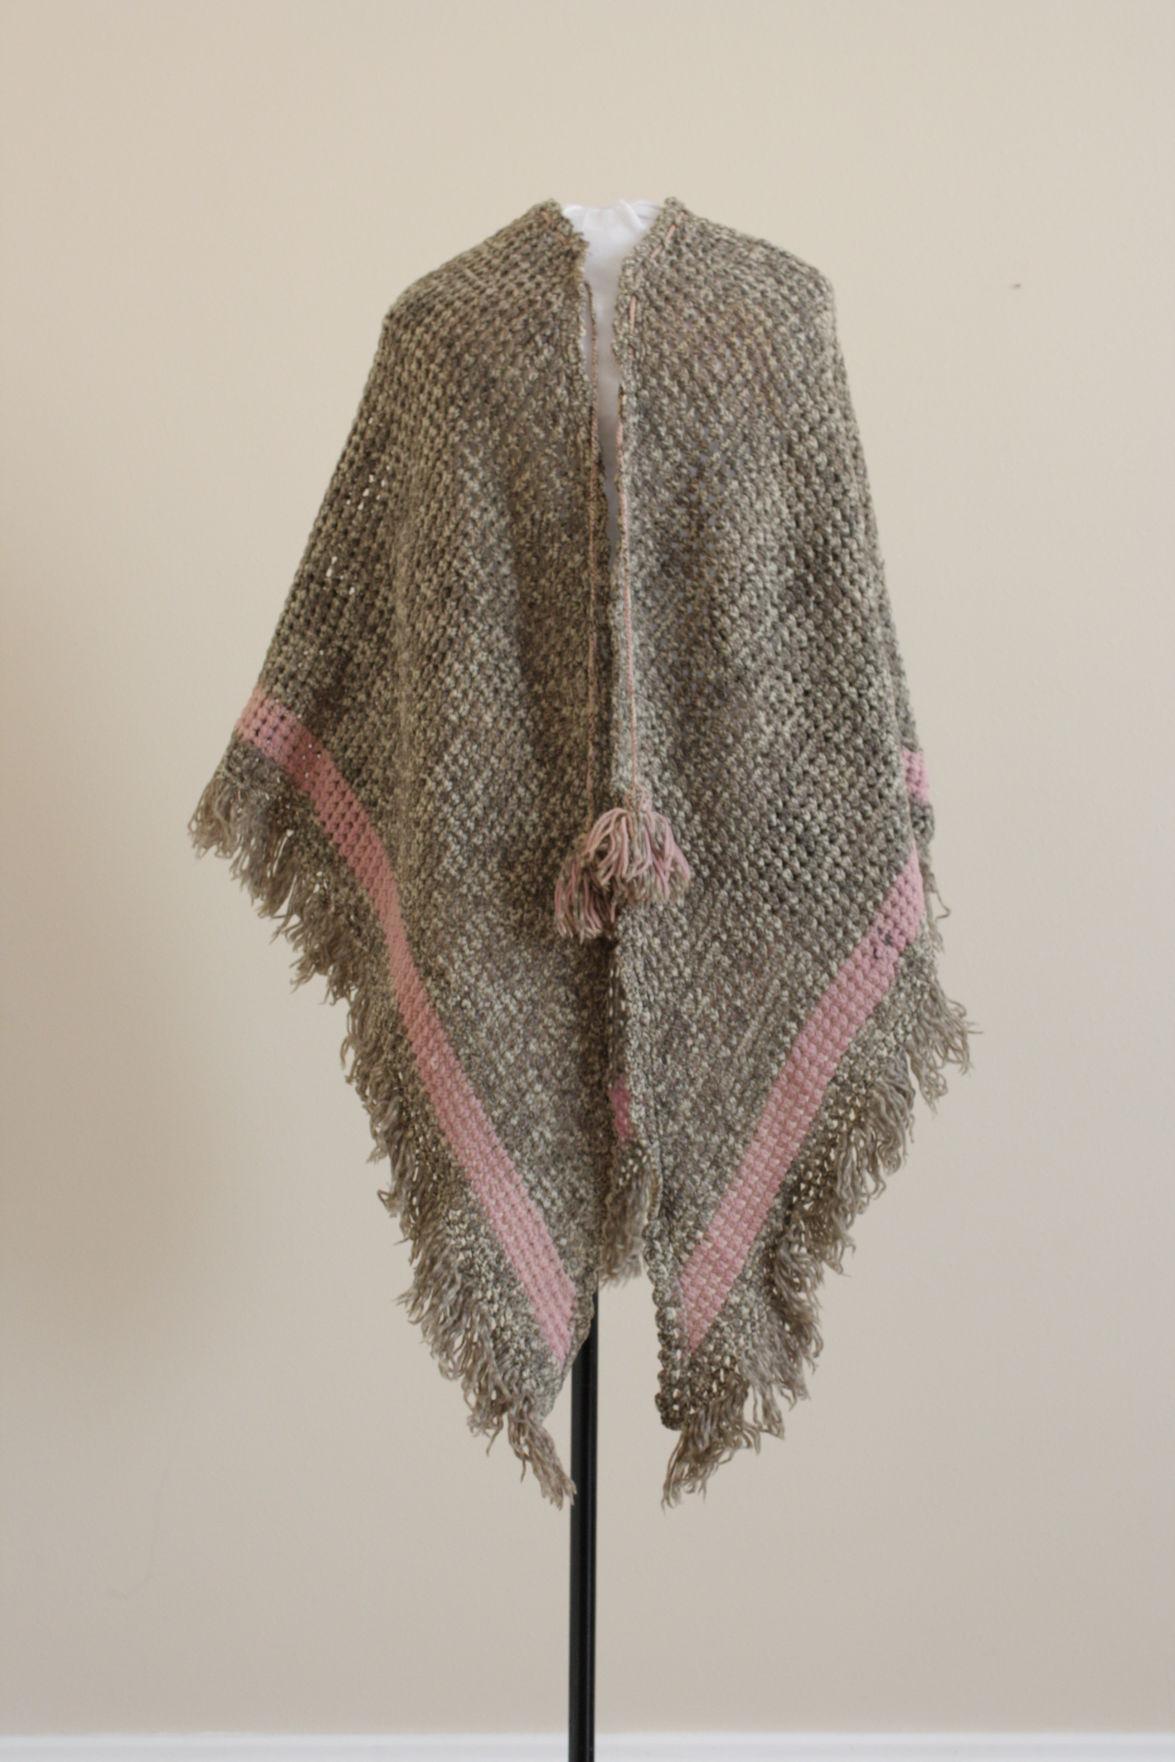 Things That Matter: Johanna Heileman's shawl